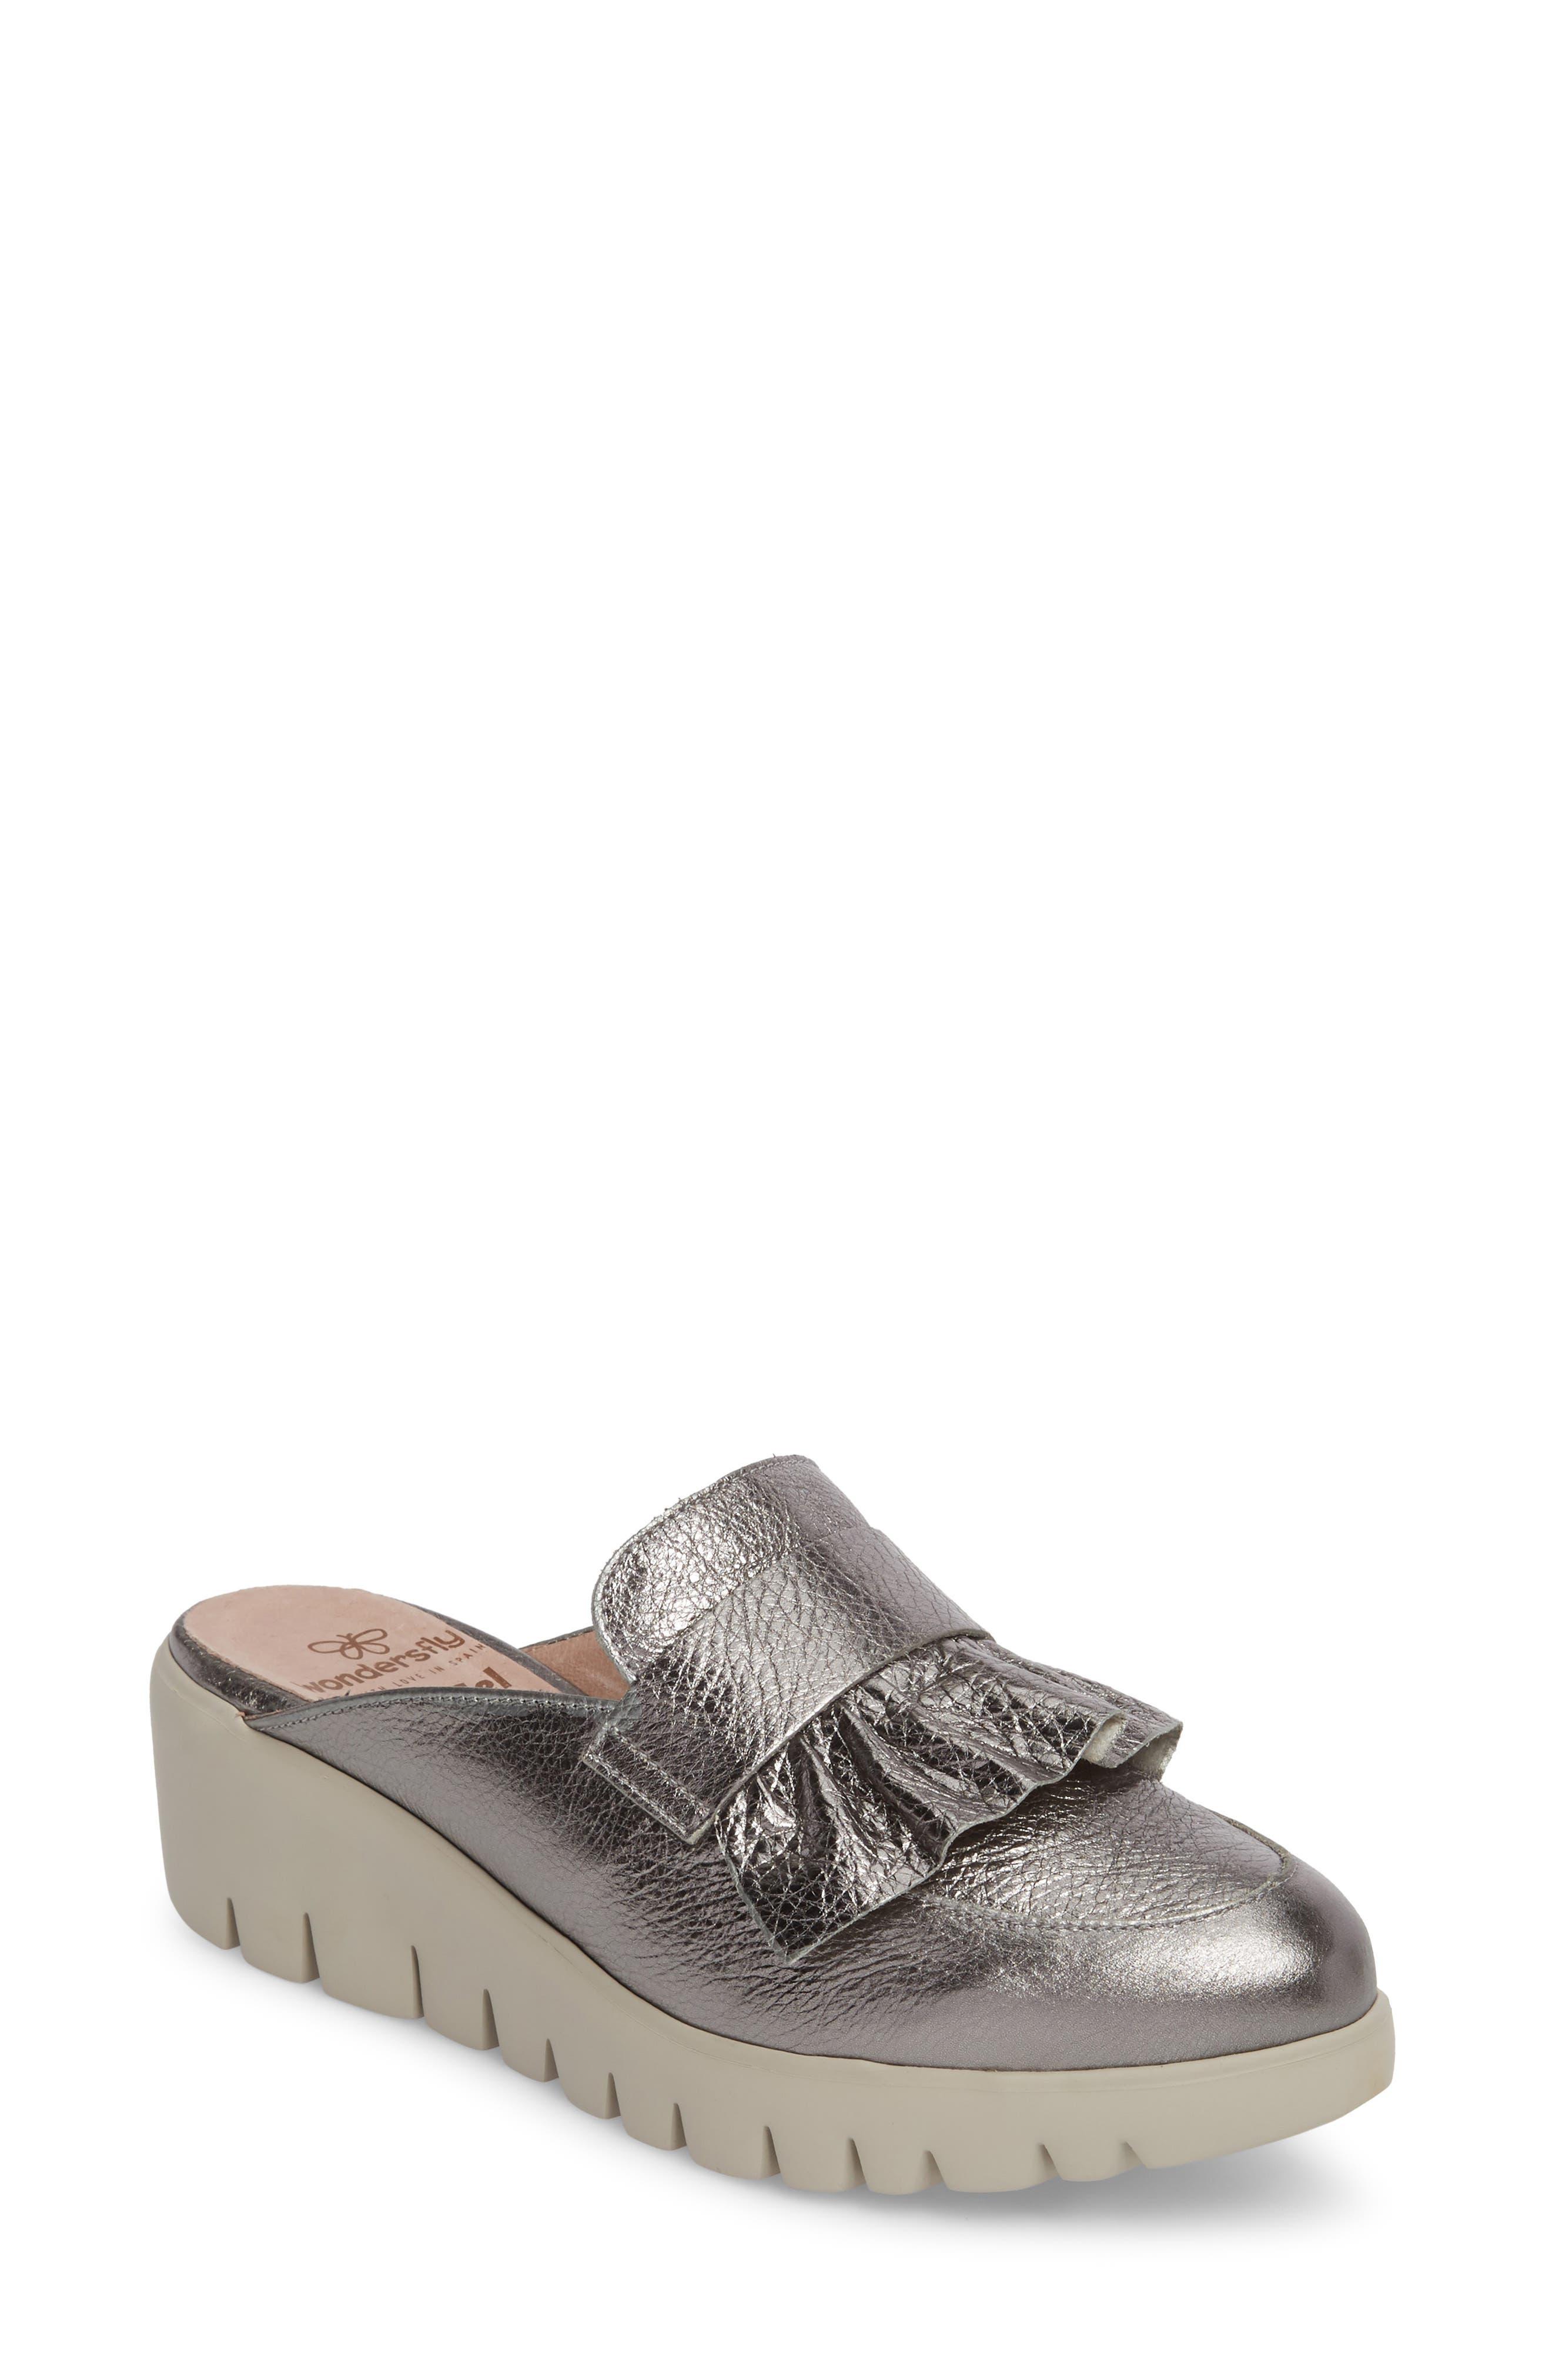 Loafer Mule,                         Main,                         color, Plomo Silver Beige